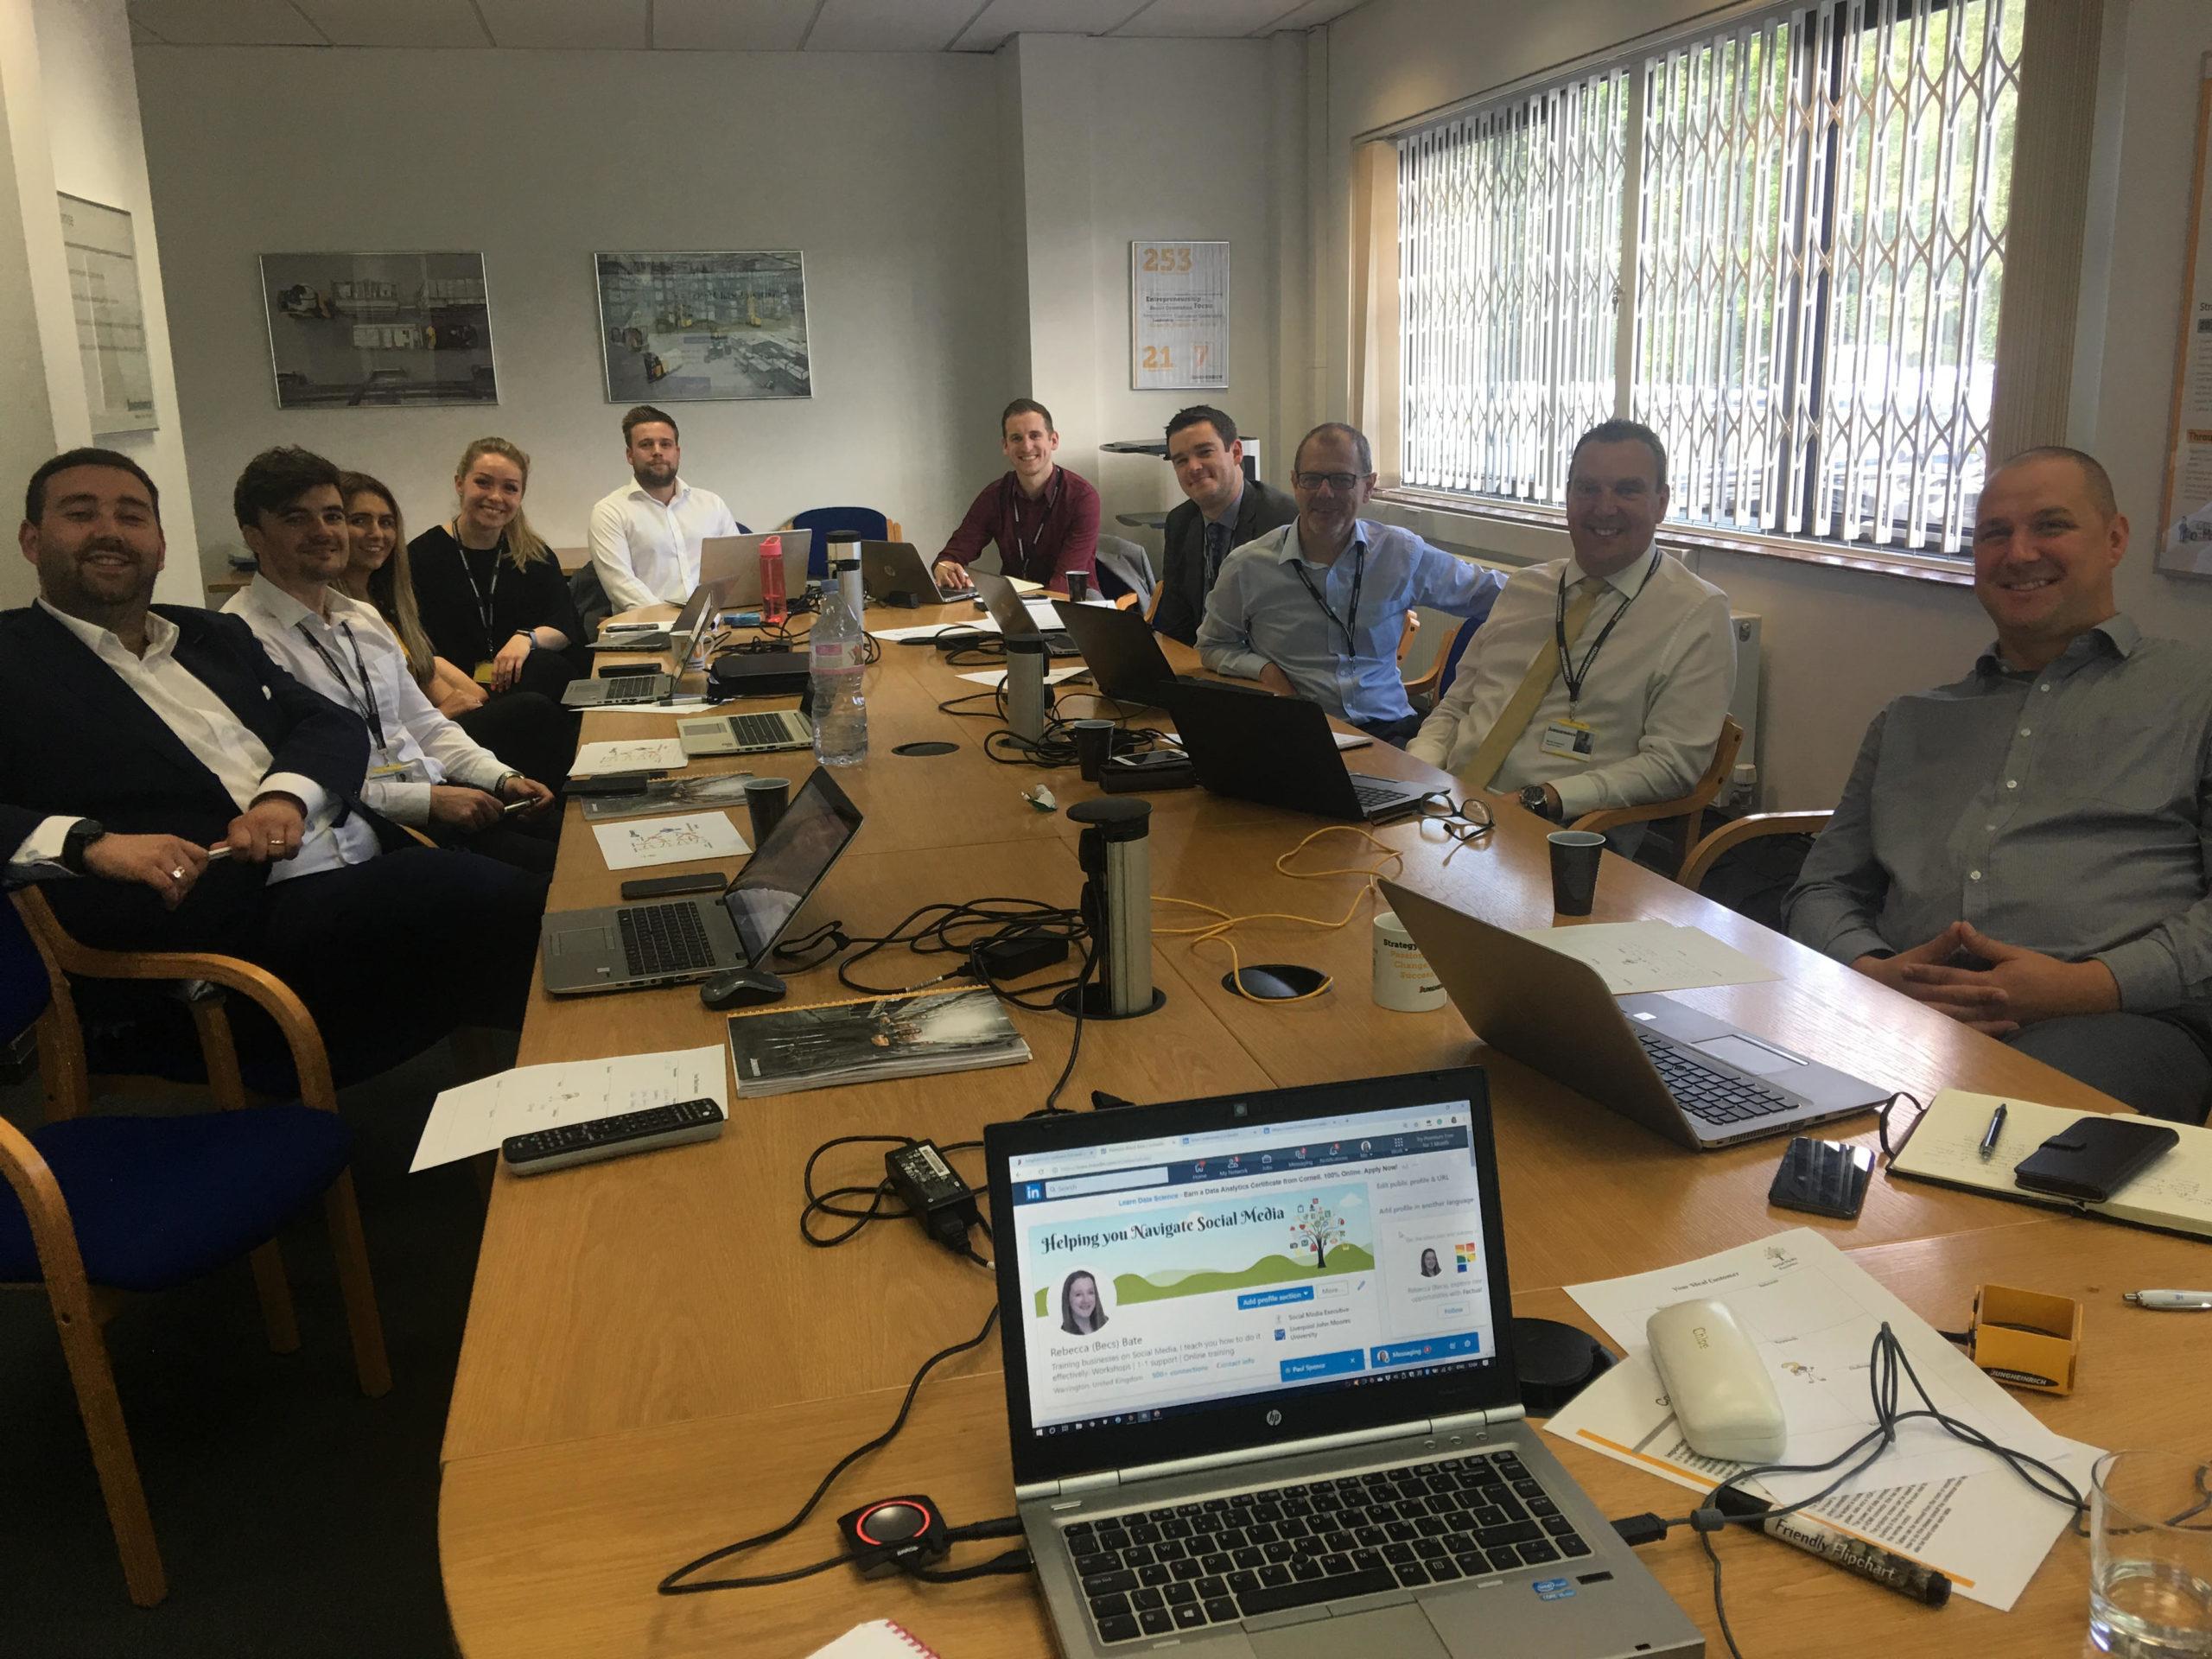 LinkedIn training session at Junheinrich